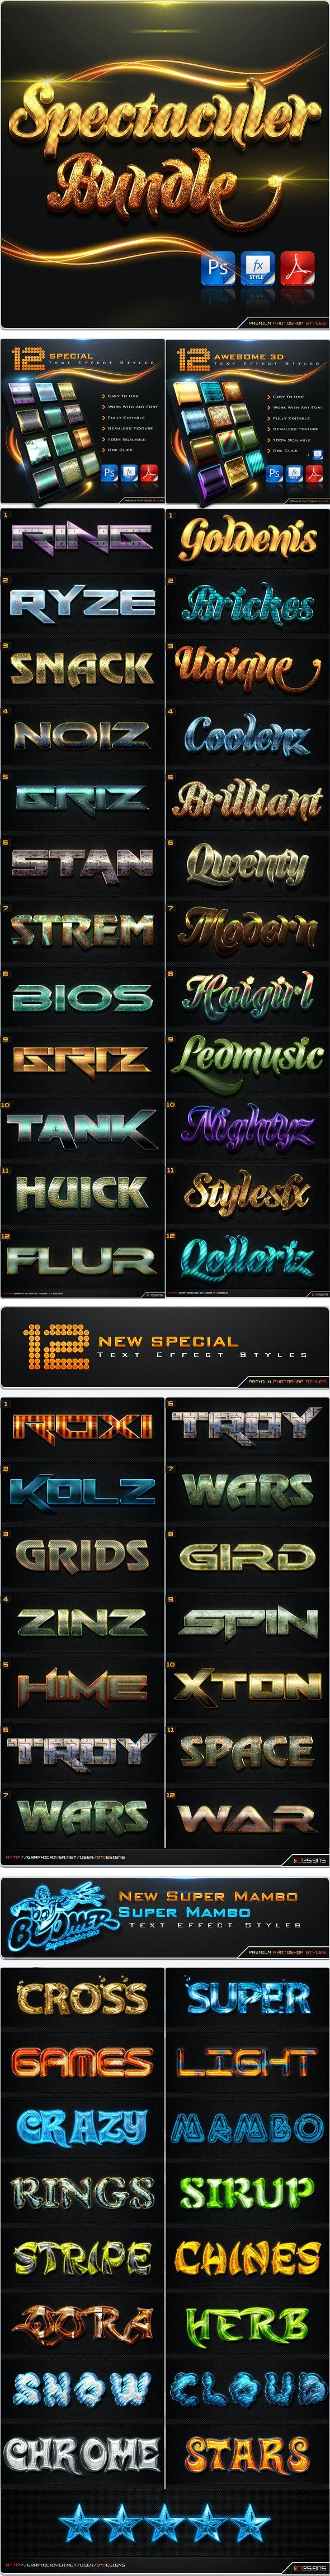 Spectaculer Bundle - Text Effects Styles